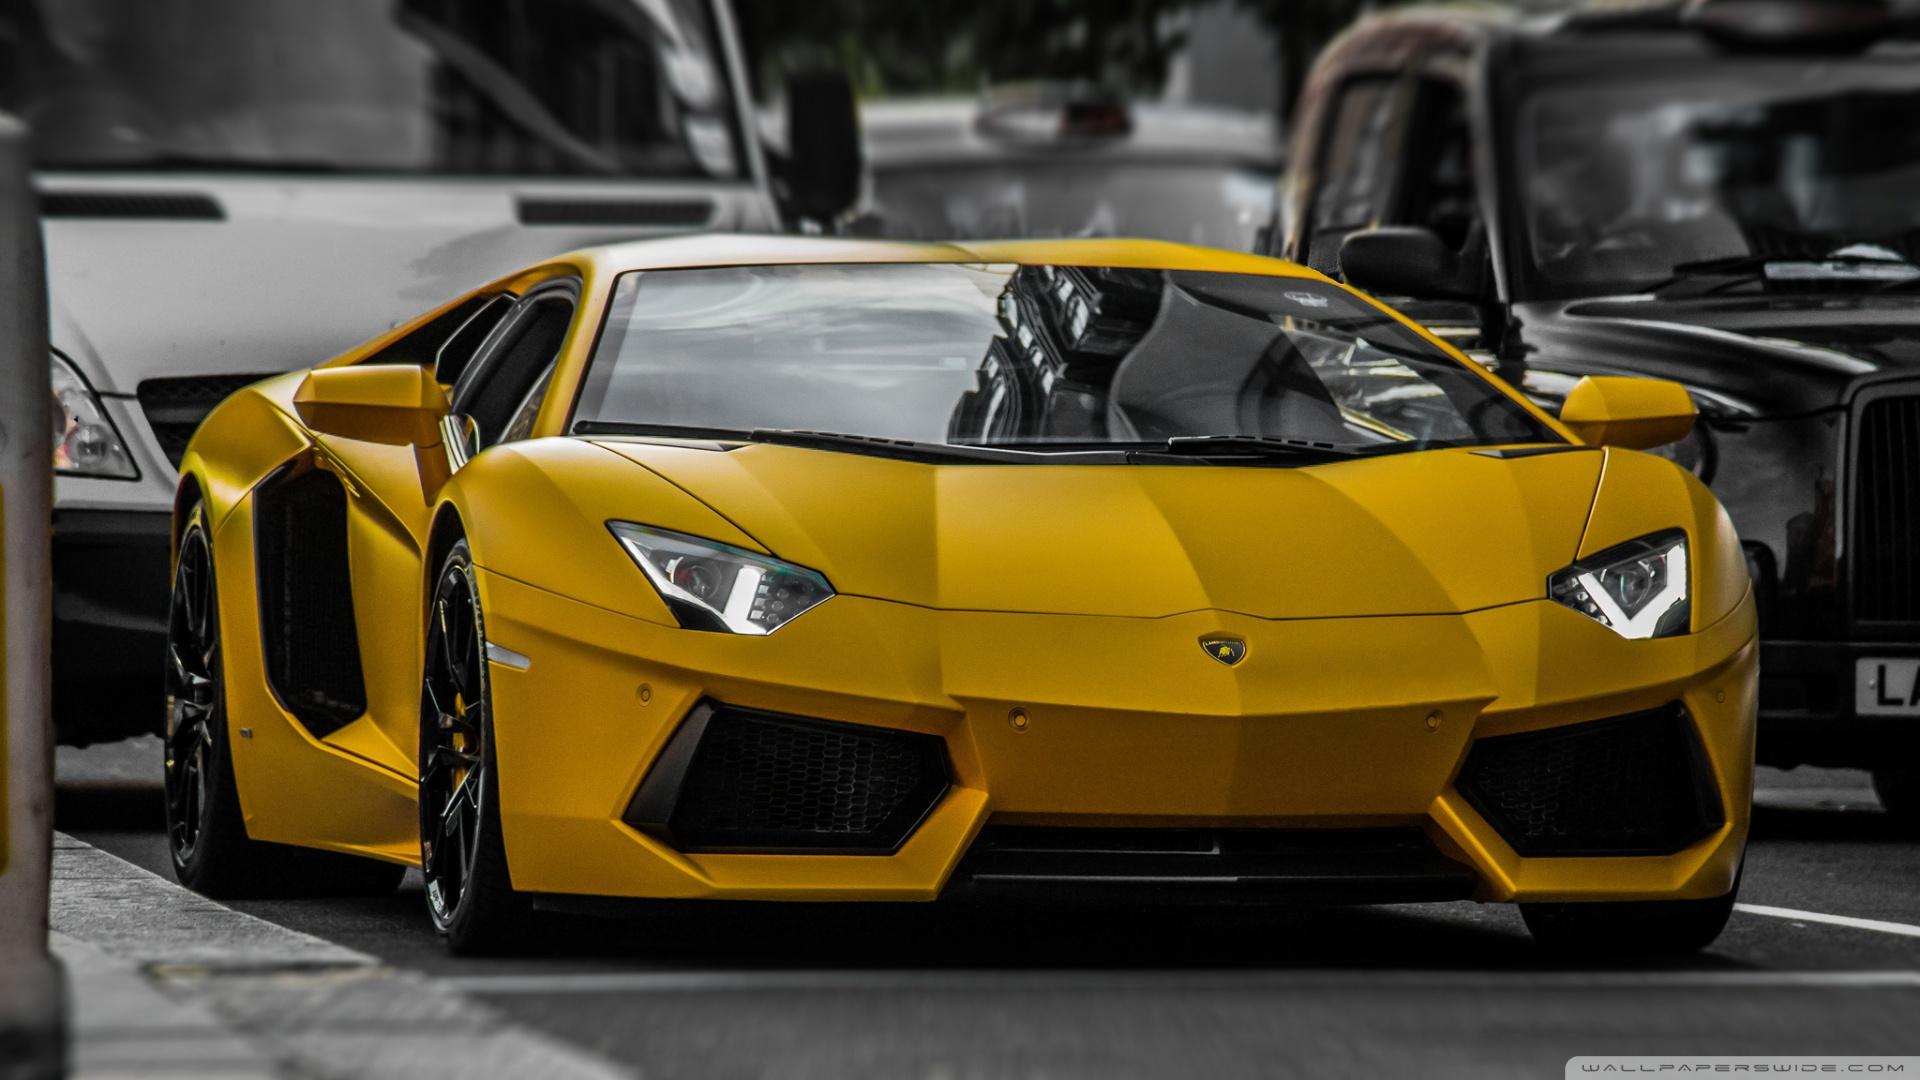 Yellow Lamborghini HDR 4K HD Desktop Wallpaper for 4K Ultra HD 1920x1080